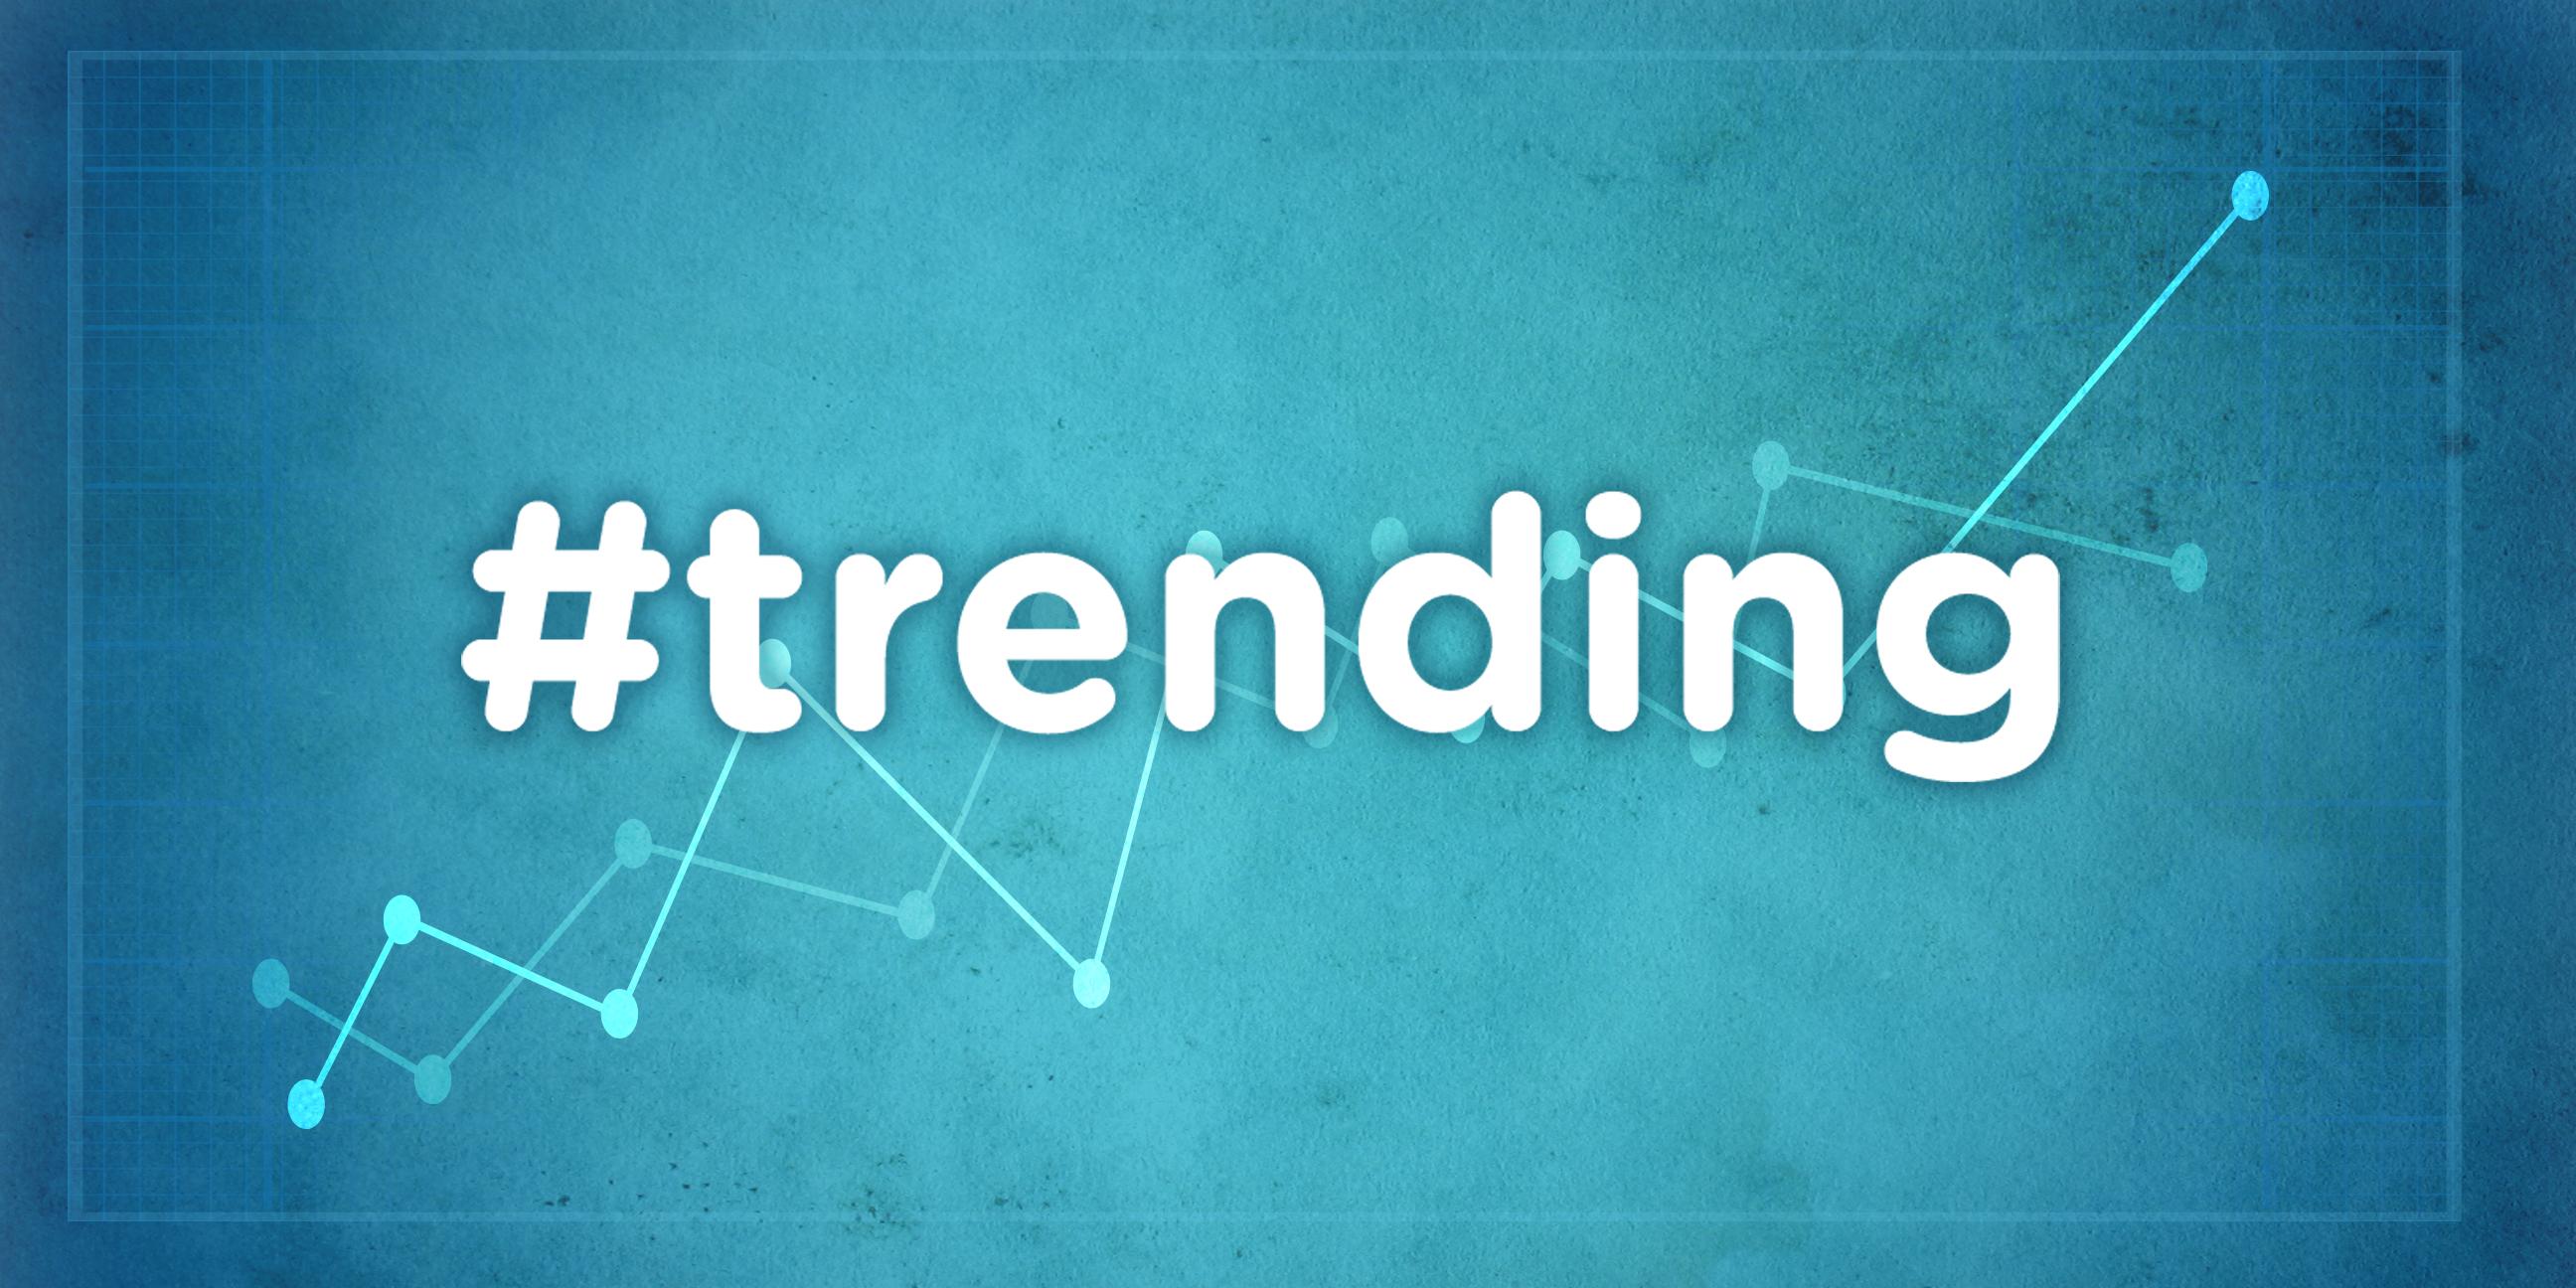 trending on tiktok - galaxy marketing